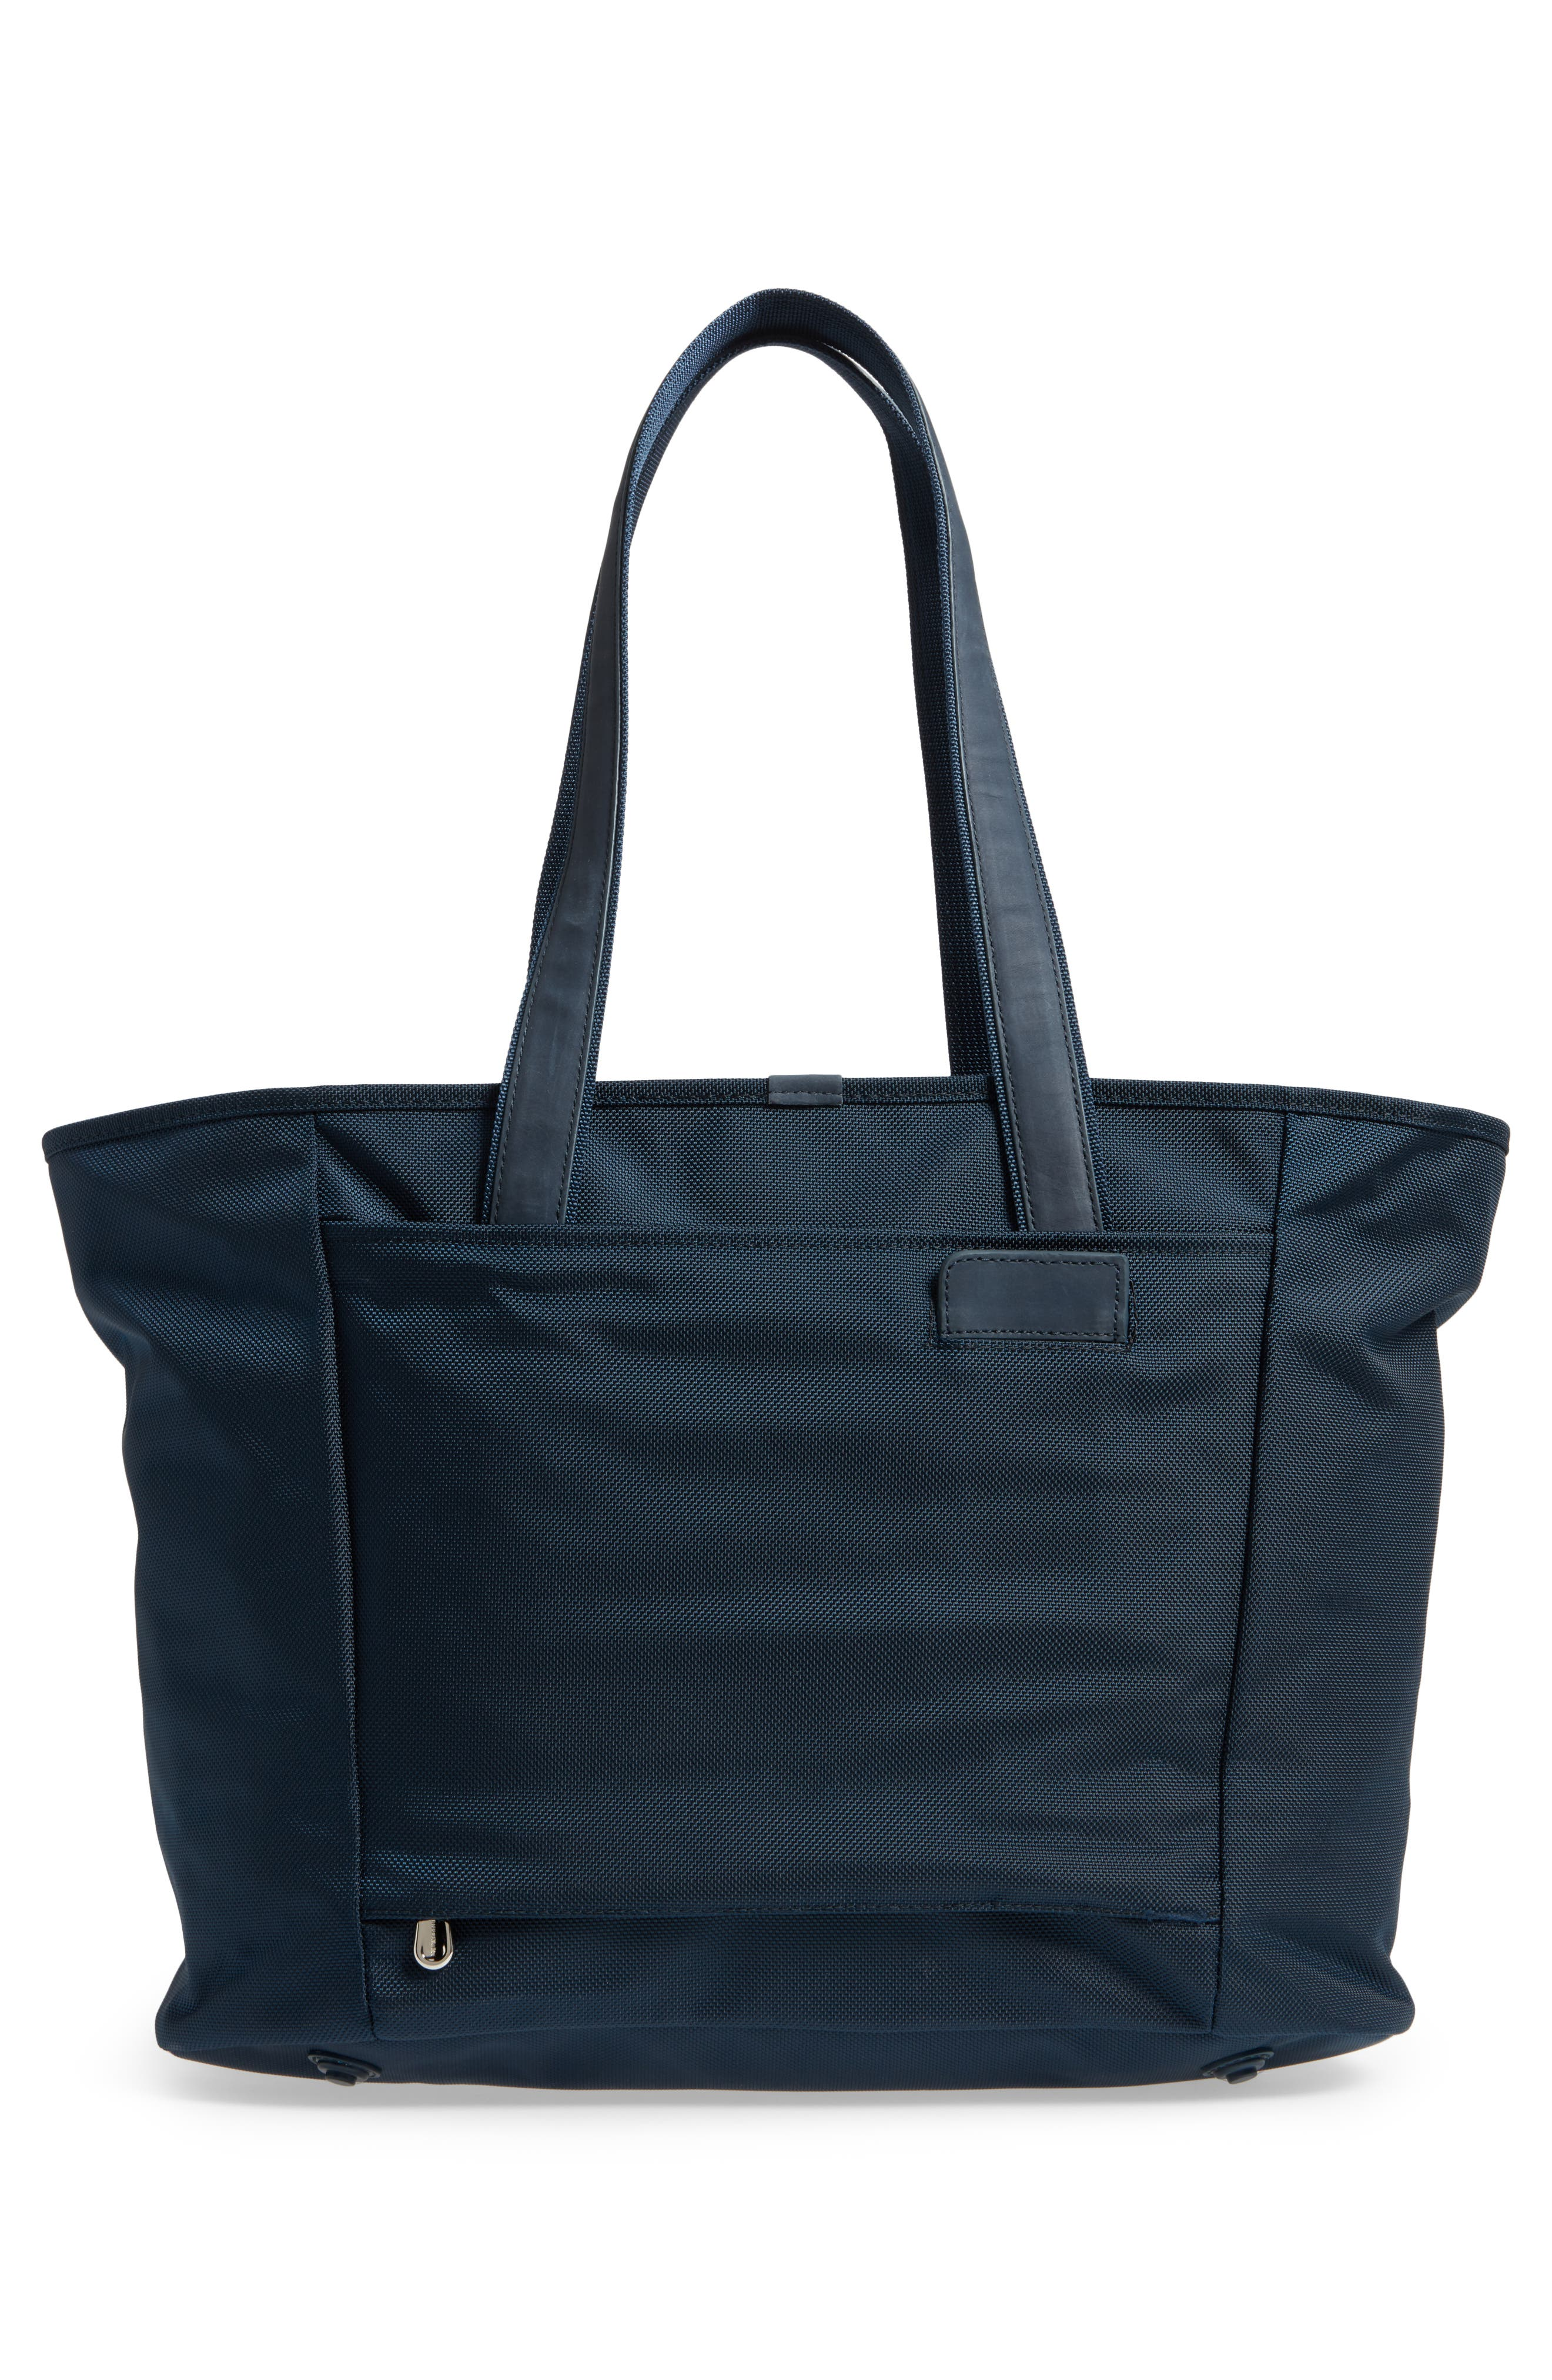 Alternate Image 3  - Briggs & Riley Ltd. Edition Tote Bag